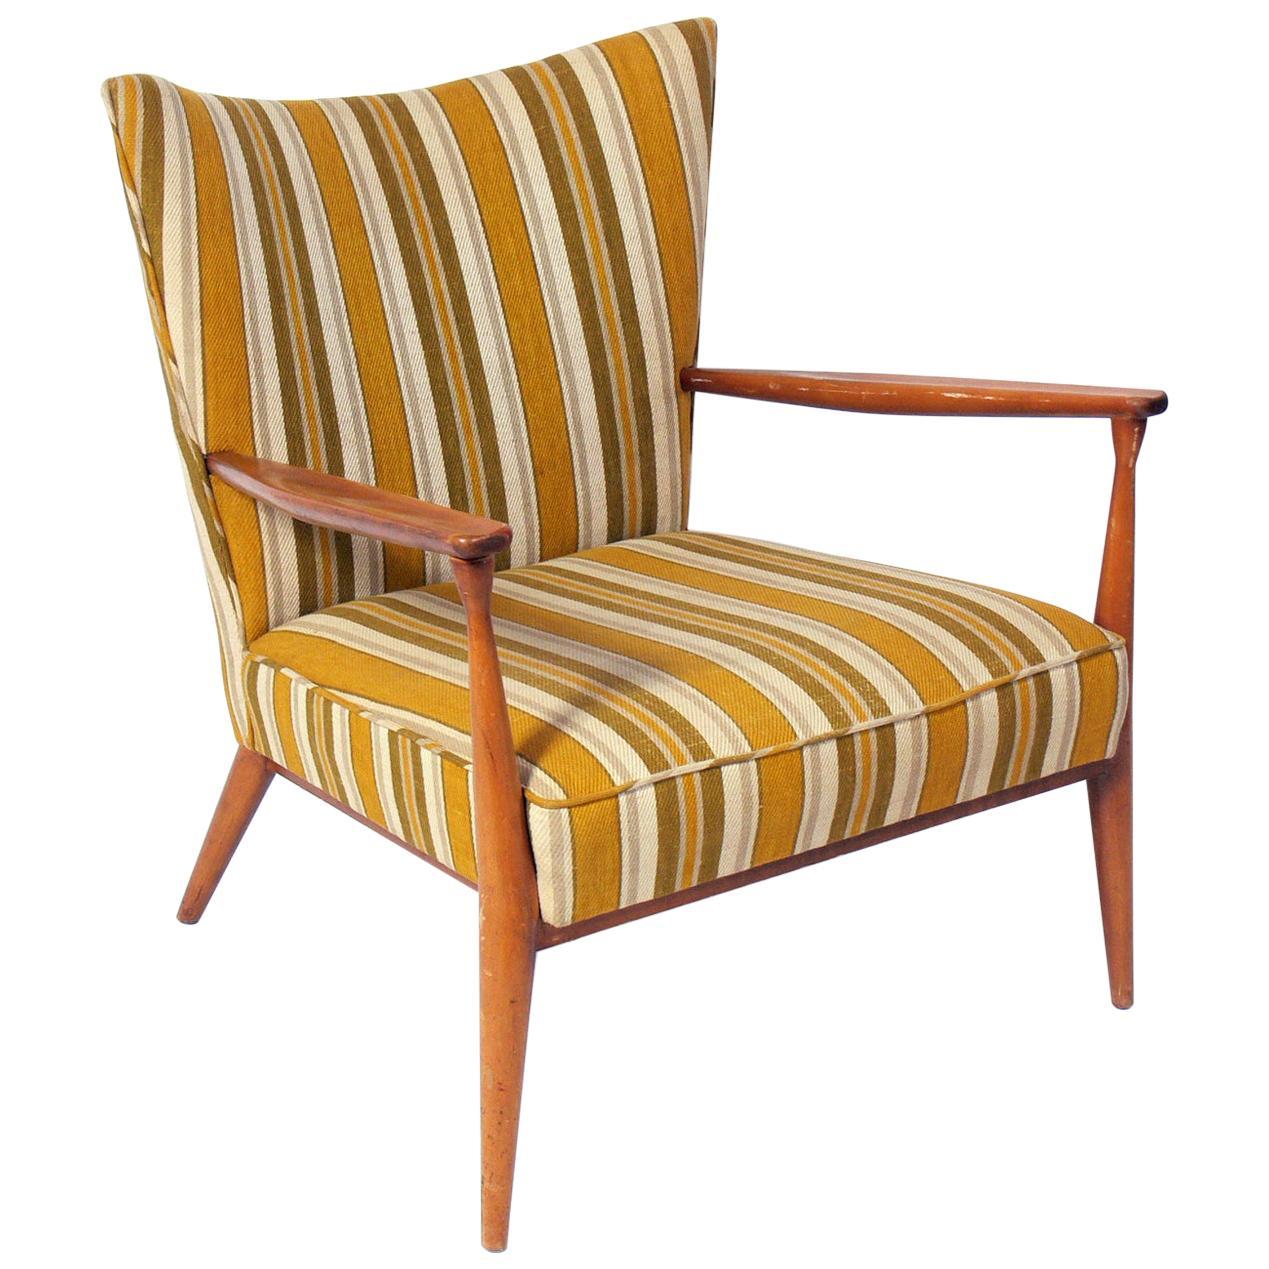 Curvaceous Paul McCobb Lounge Chair